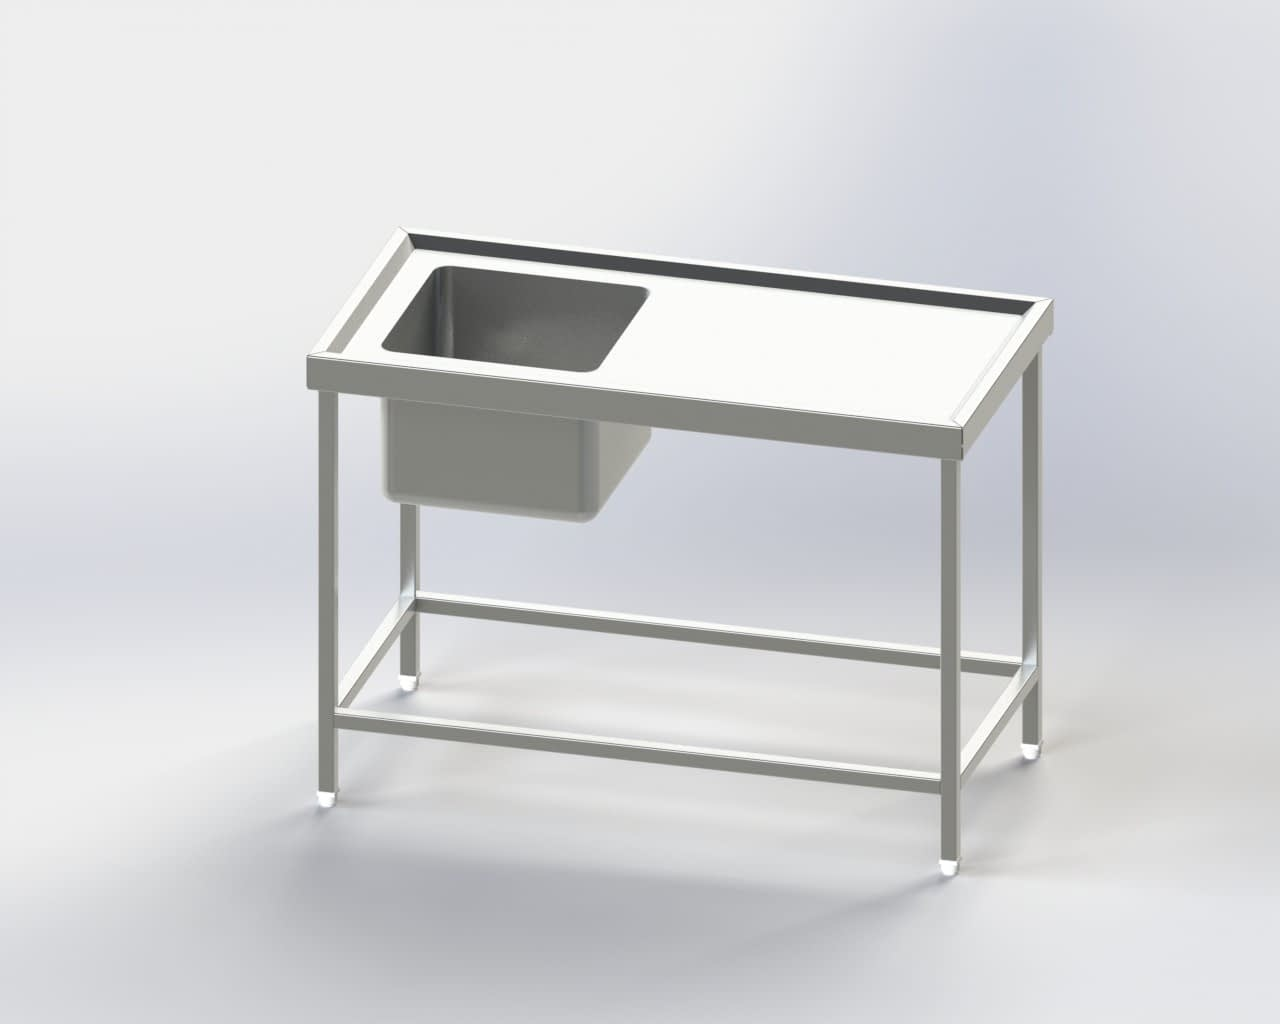 Single Sink Dish Wash Unit